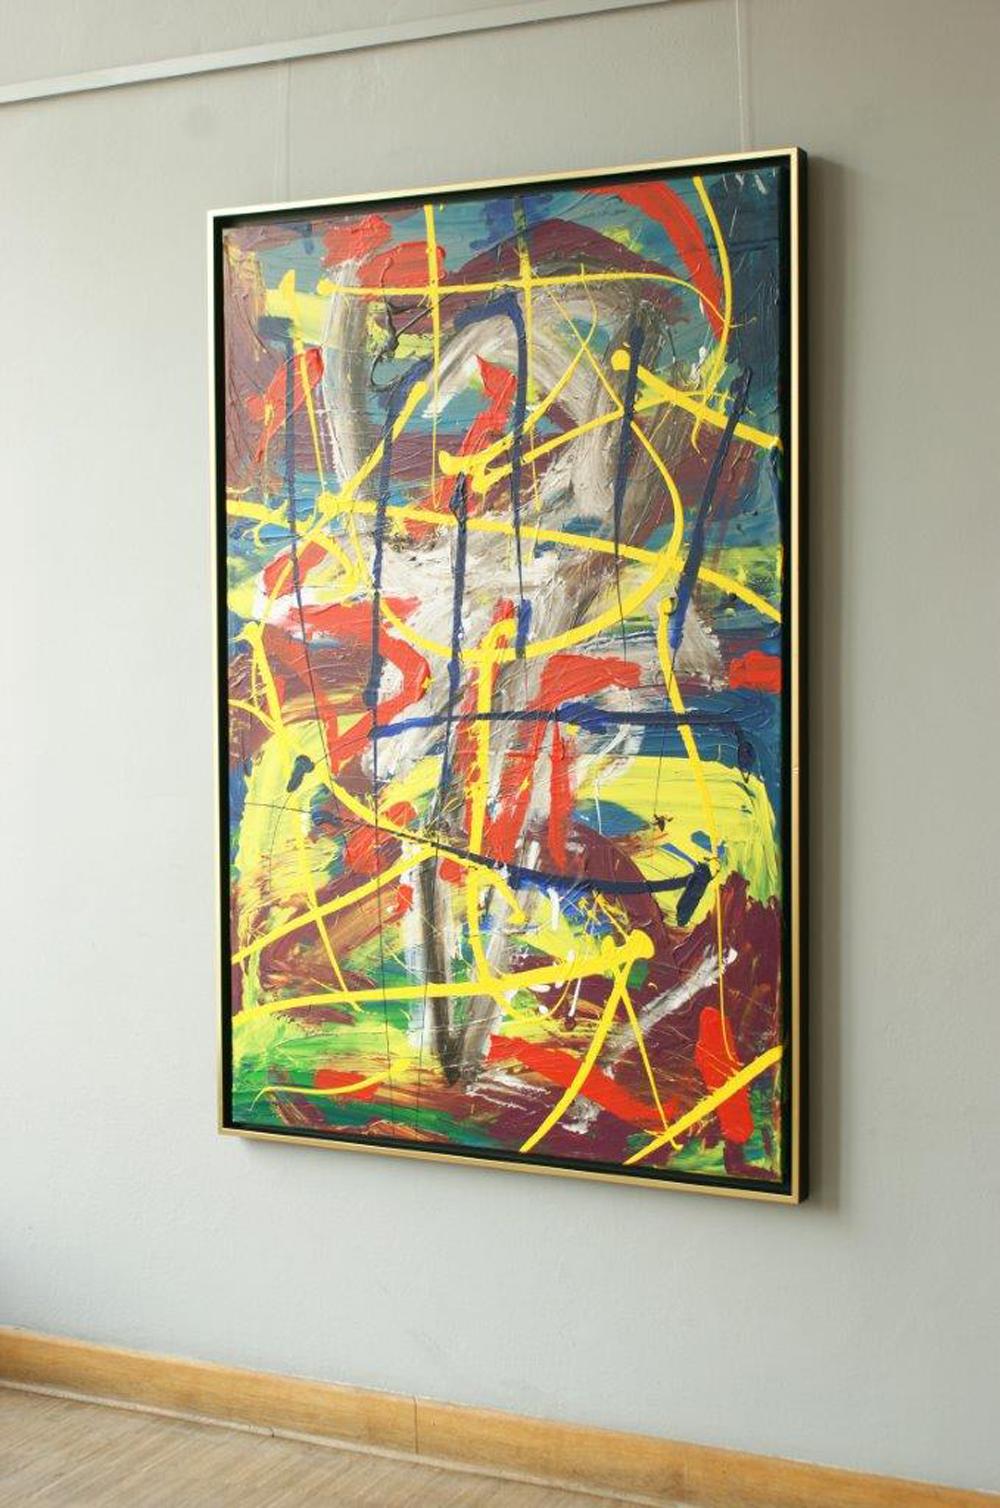 Edward Dwurnik : Painting No. 322-4882 Series XXV Year 2003